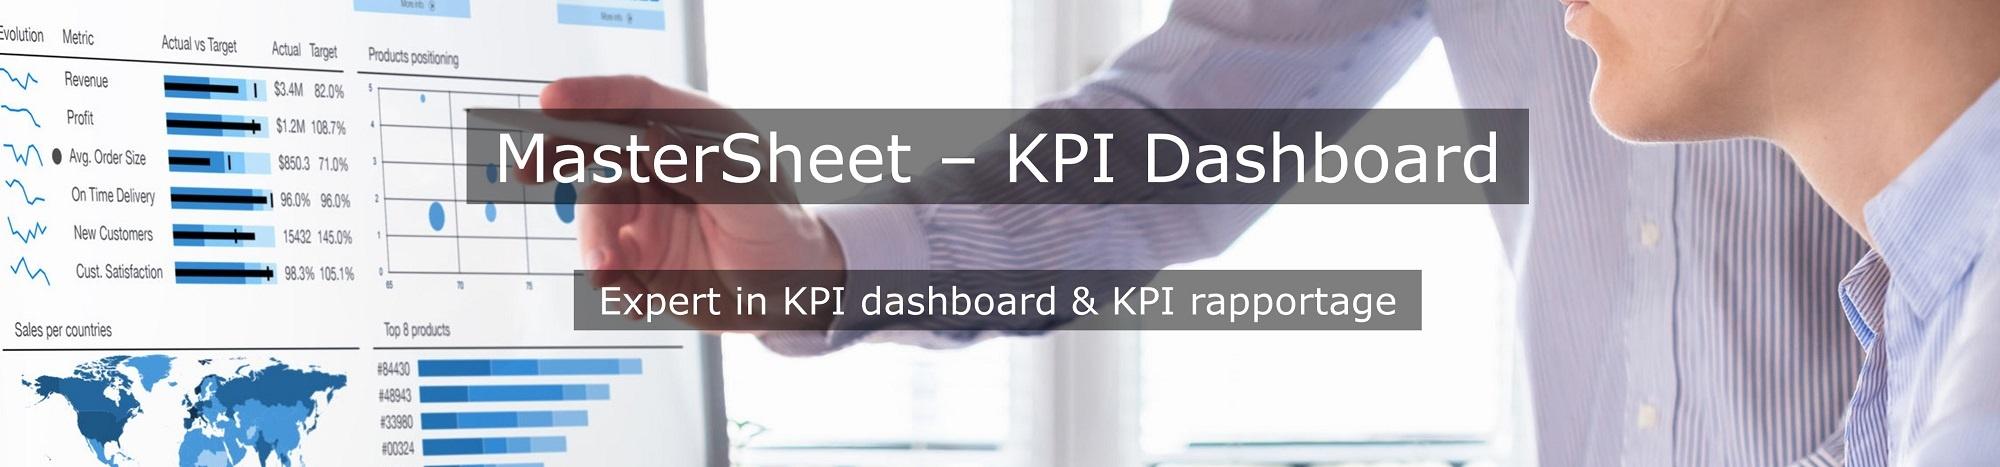 KPI Dashboard en KPI rapportage: MasterSheet helpt u met het bouwen van dashboard en rapportage